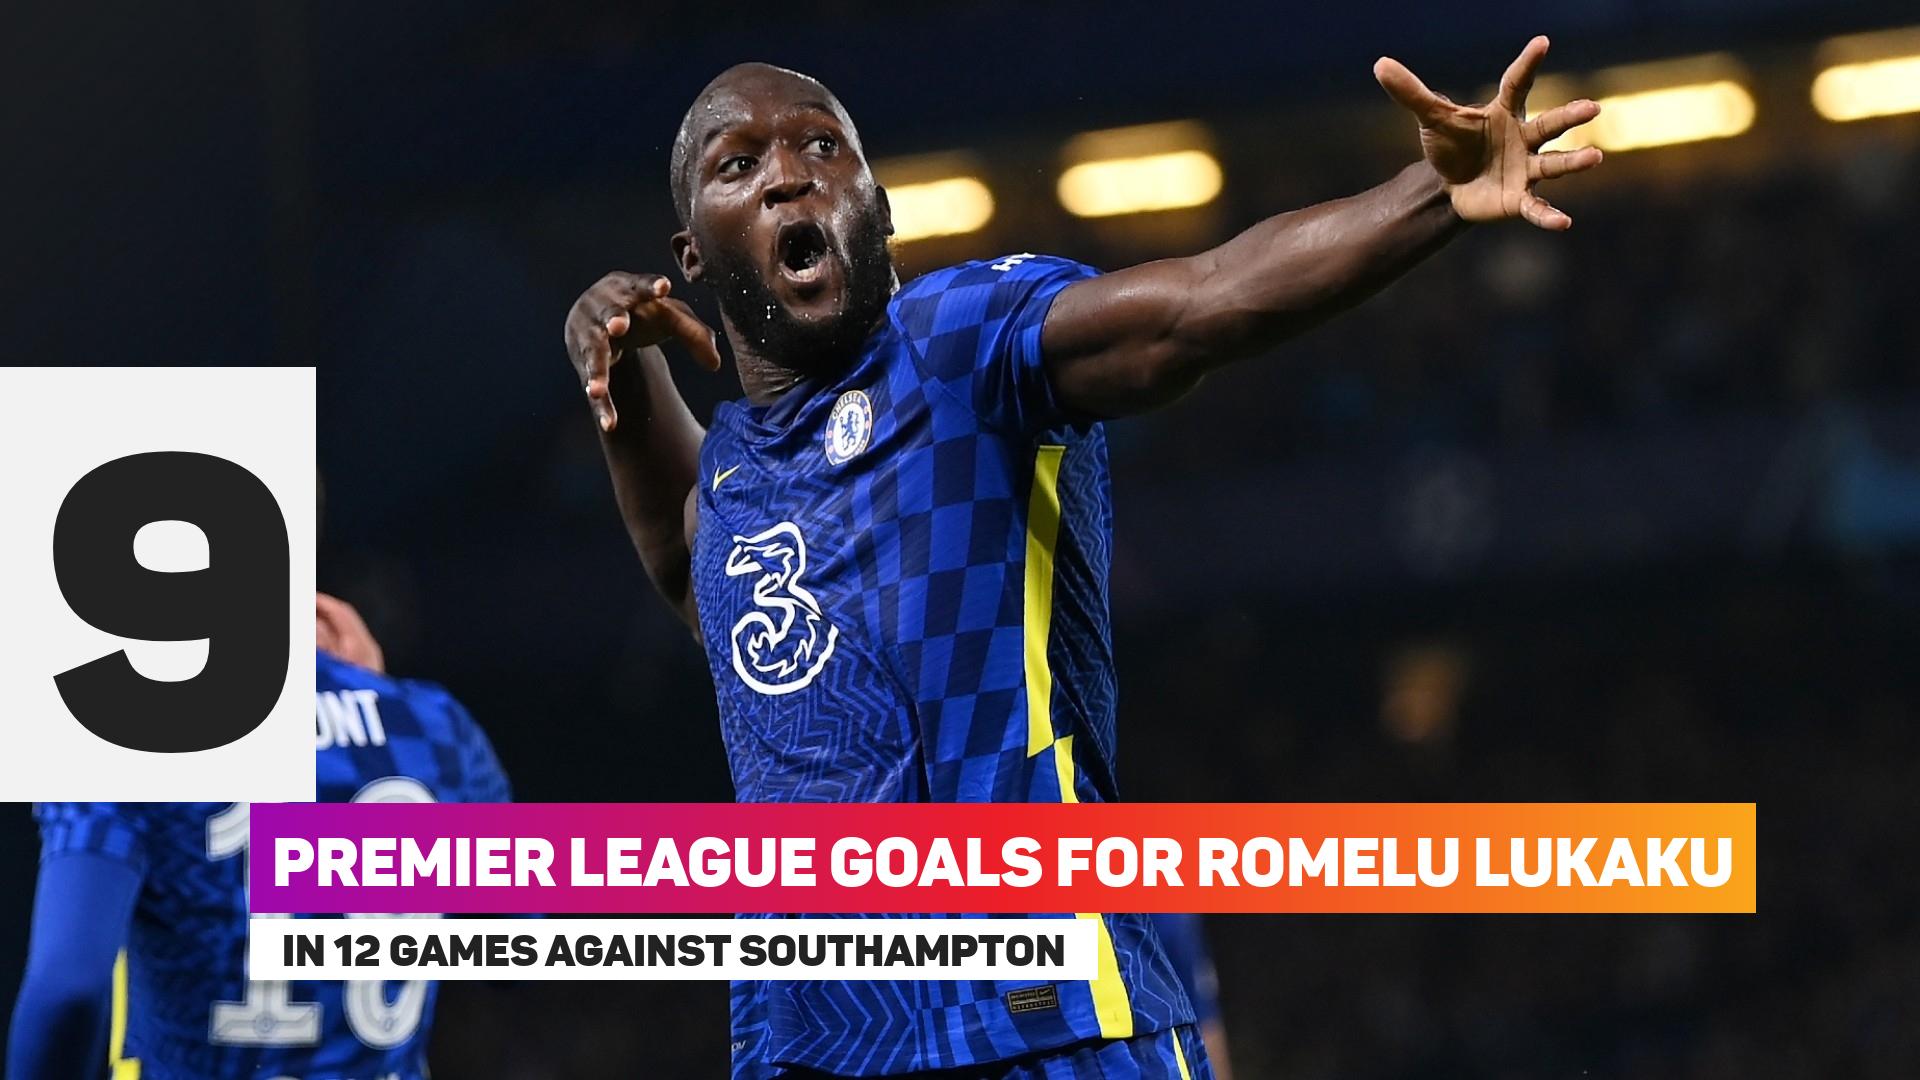 Romelu Lukaku has nine goals in 12 games against Southampton